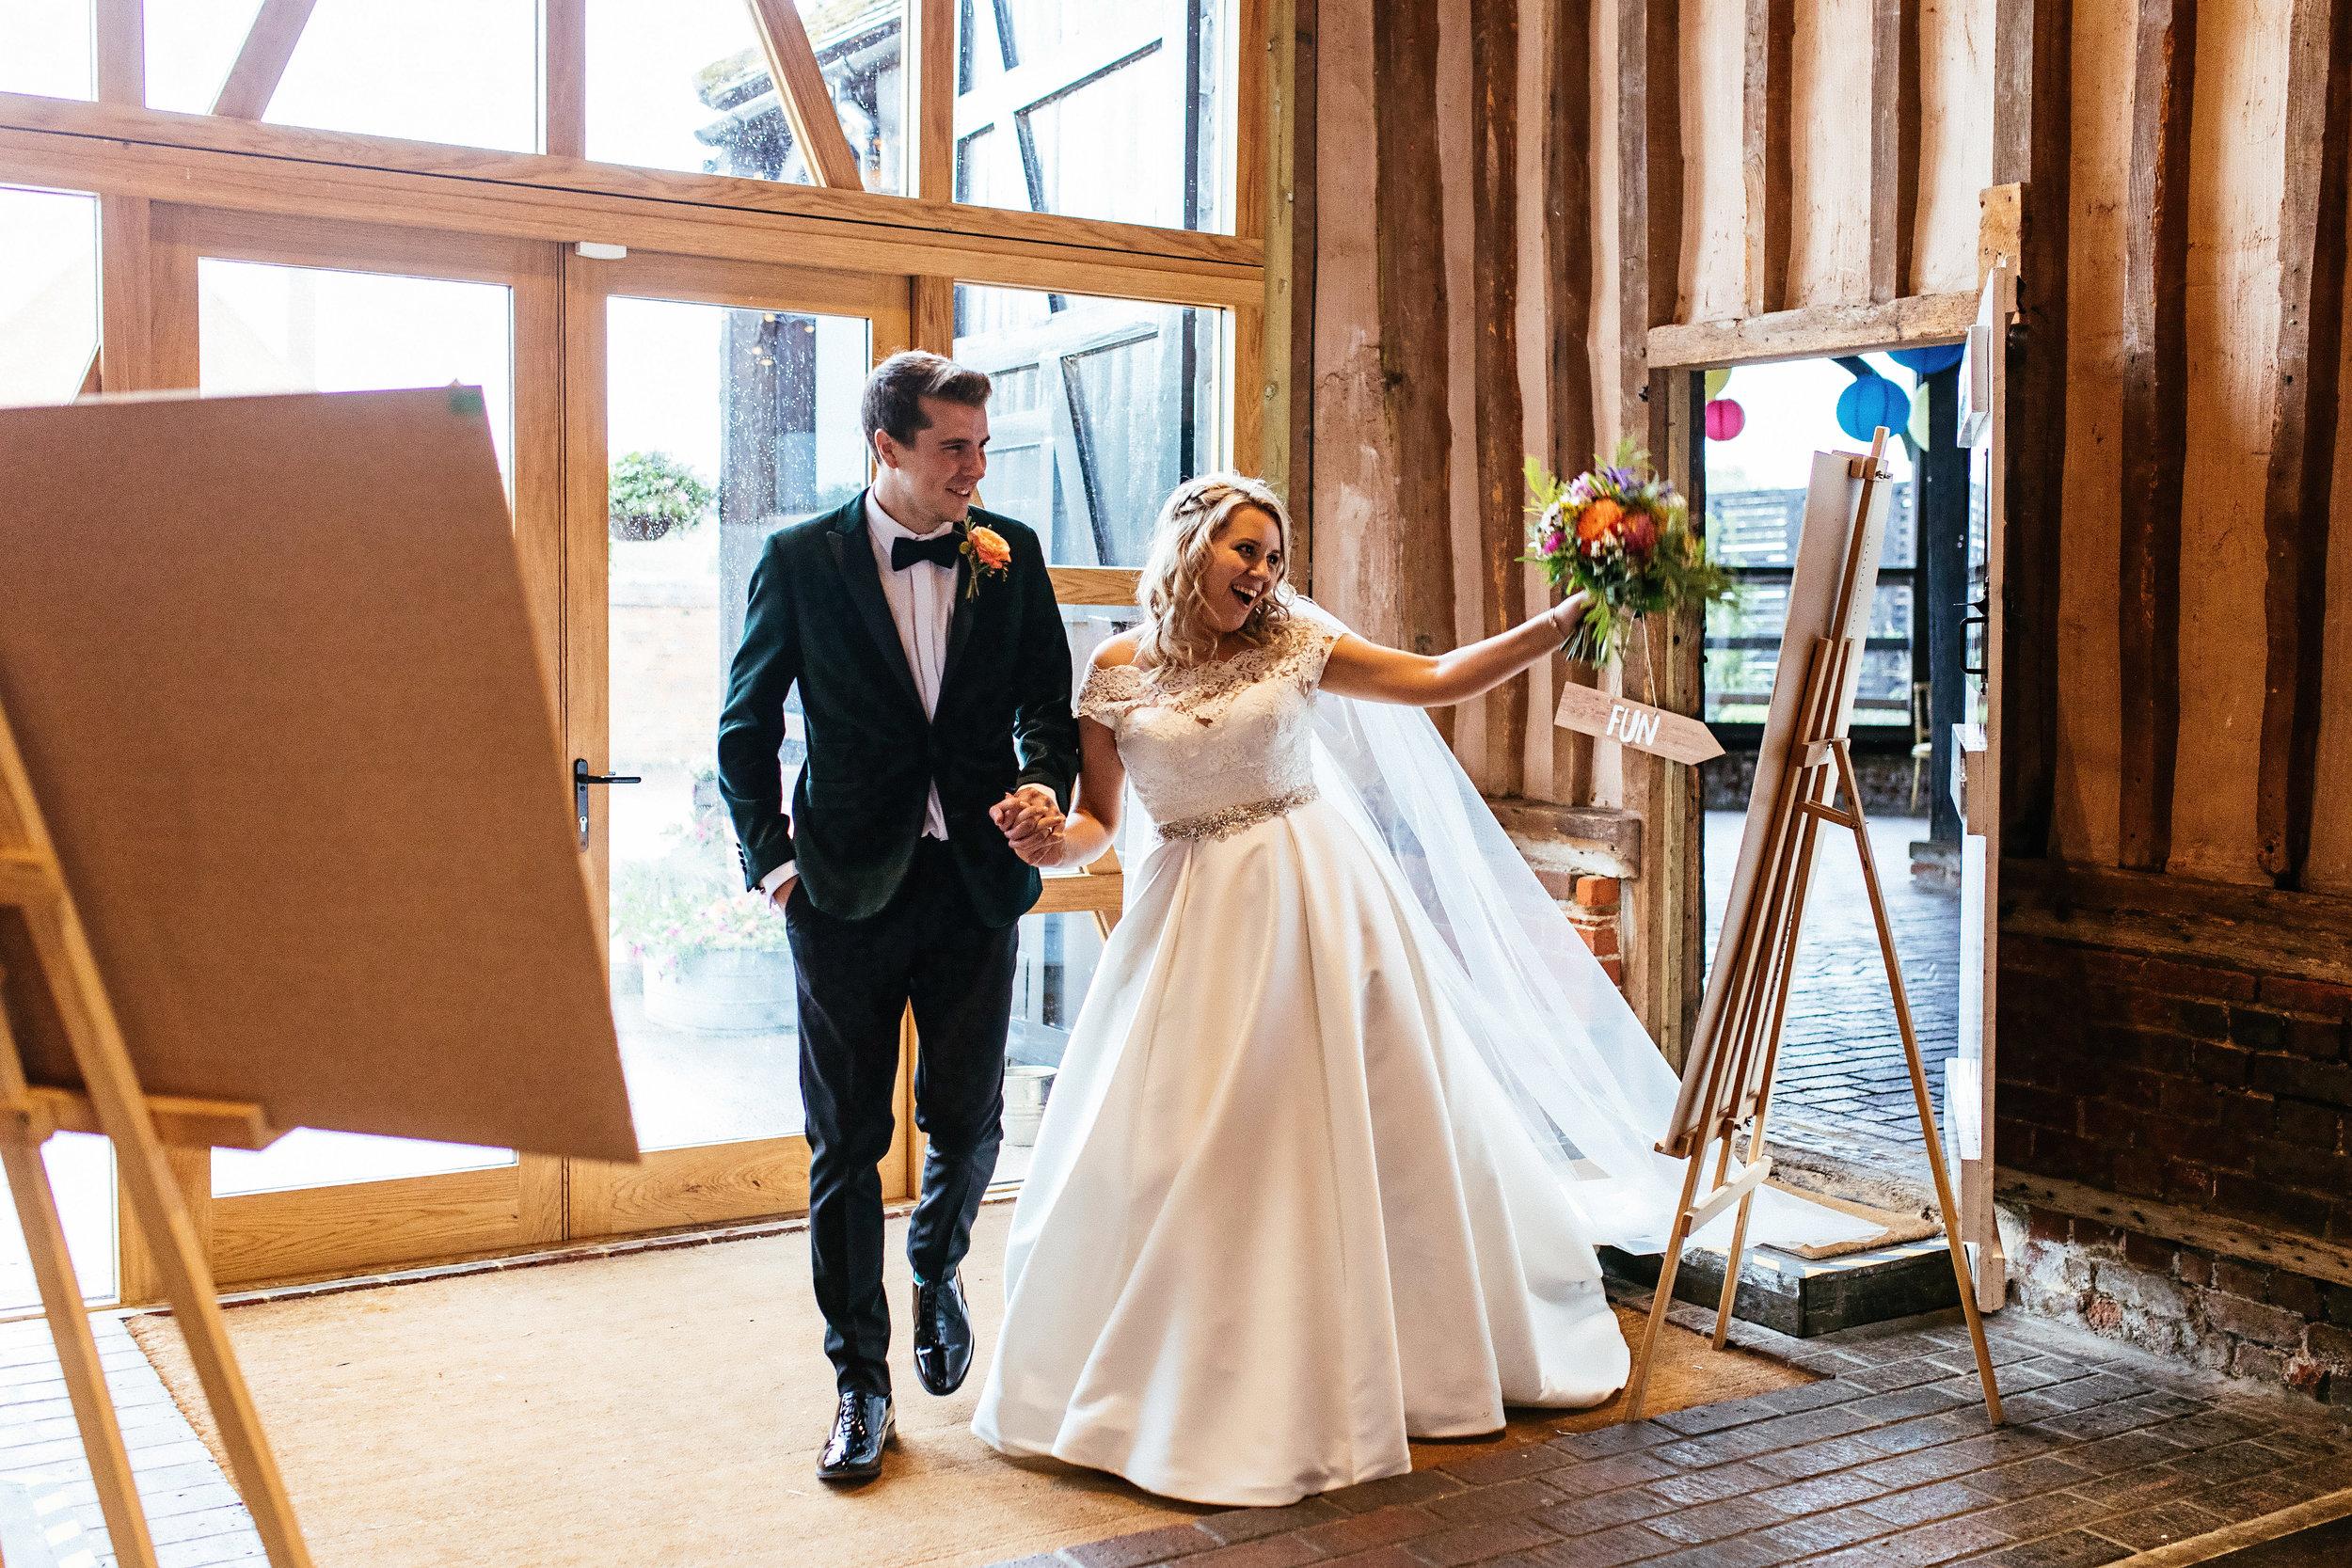 Tamara-and-Richard-Wedding-Highlights-61.jpg